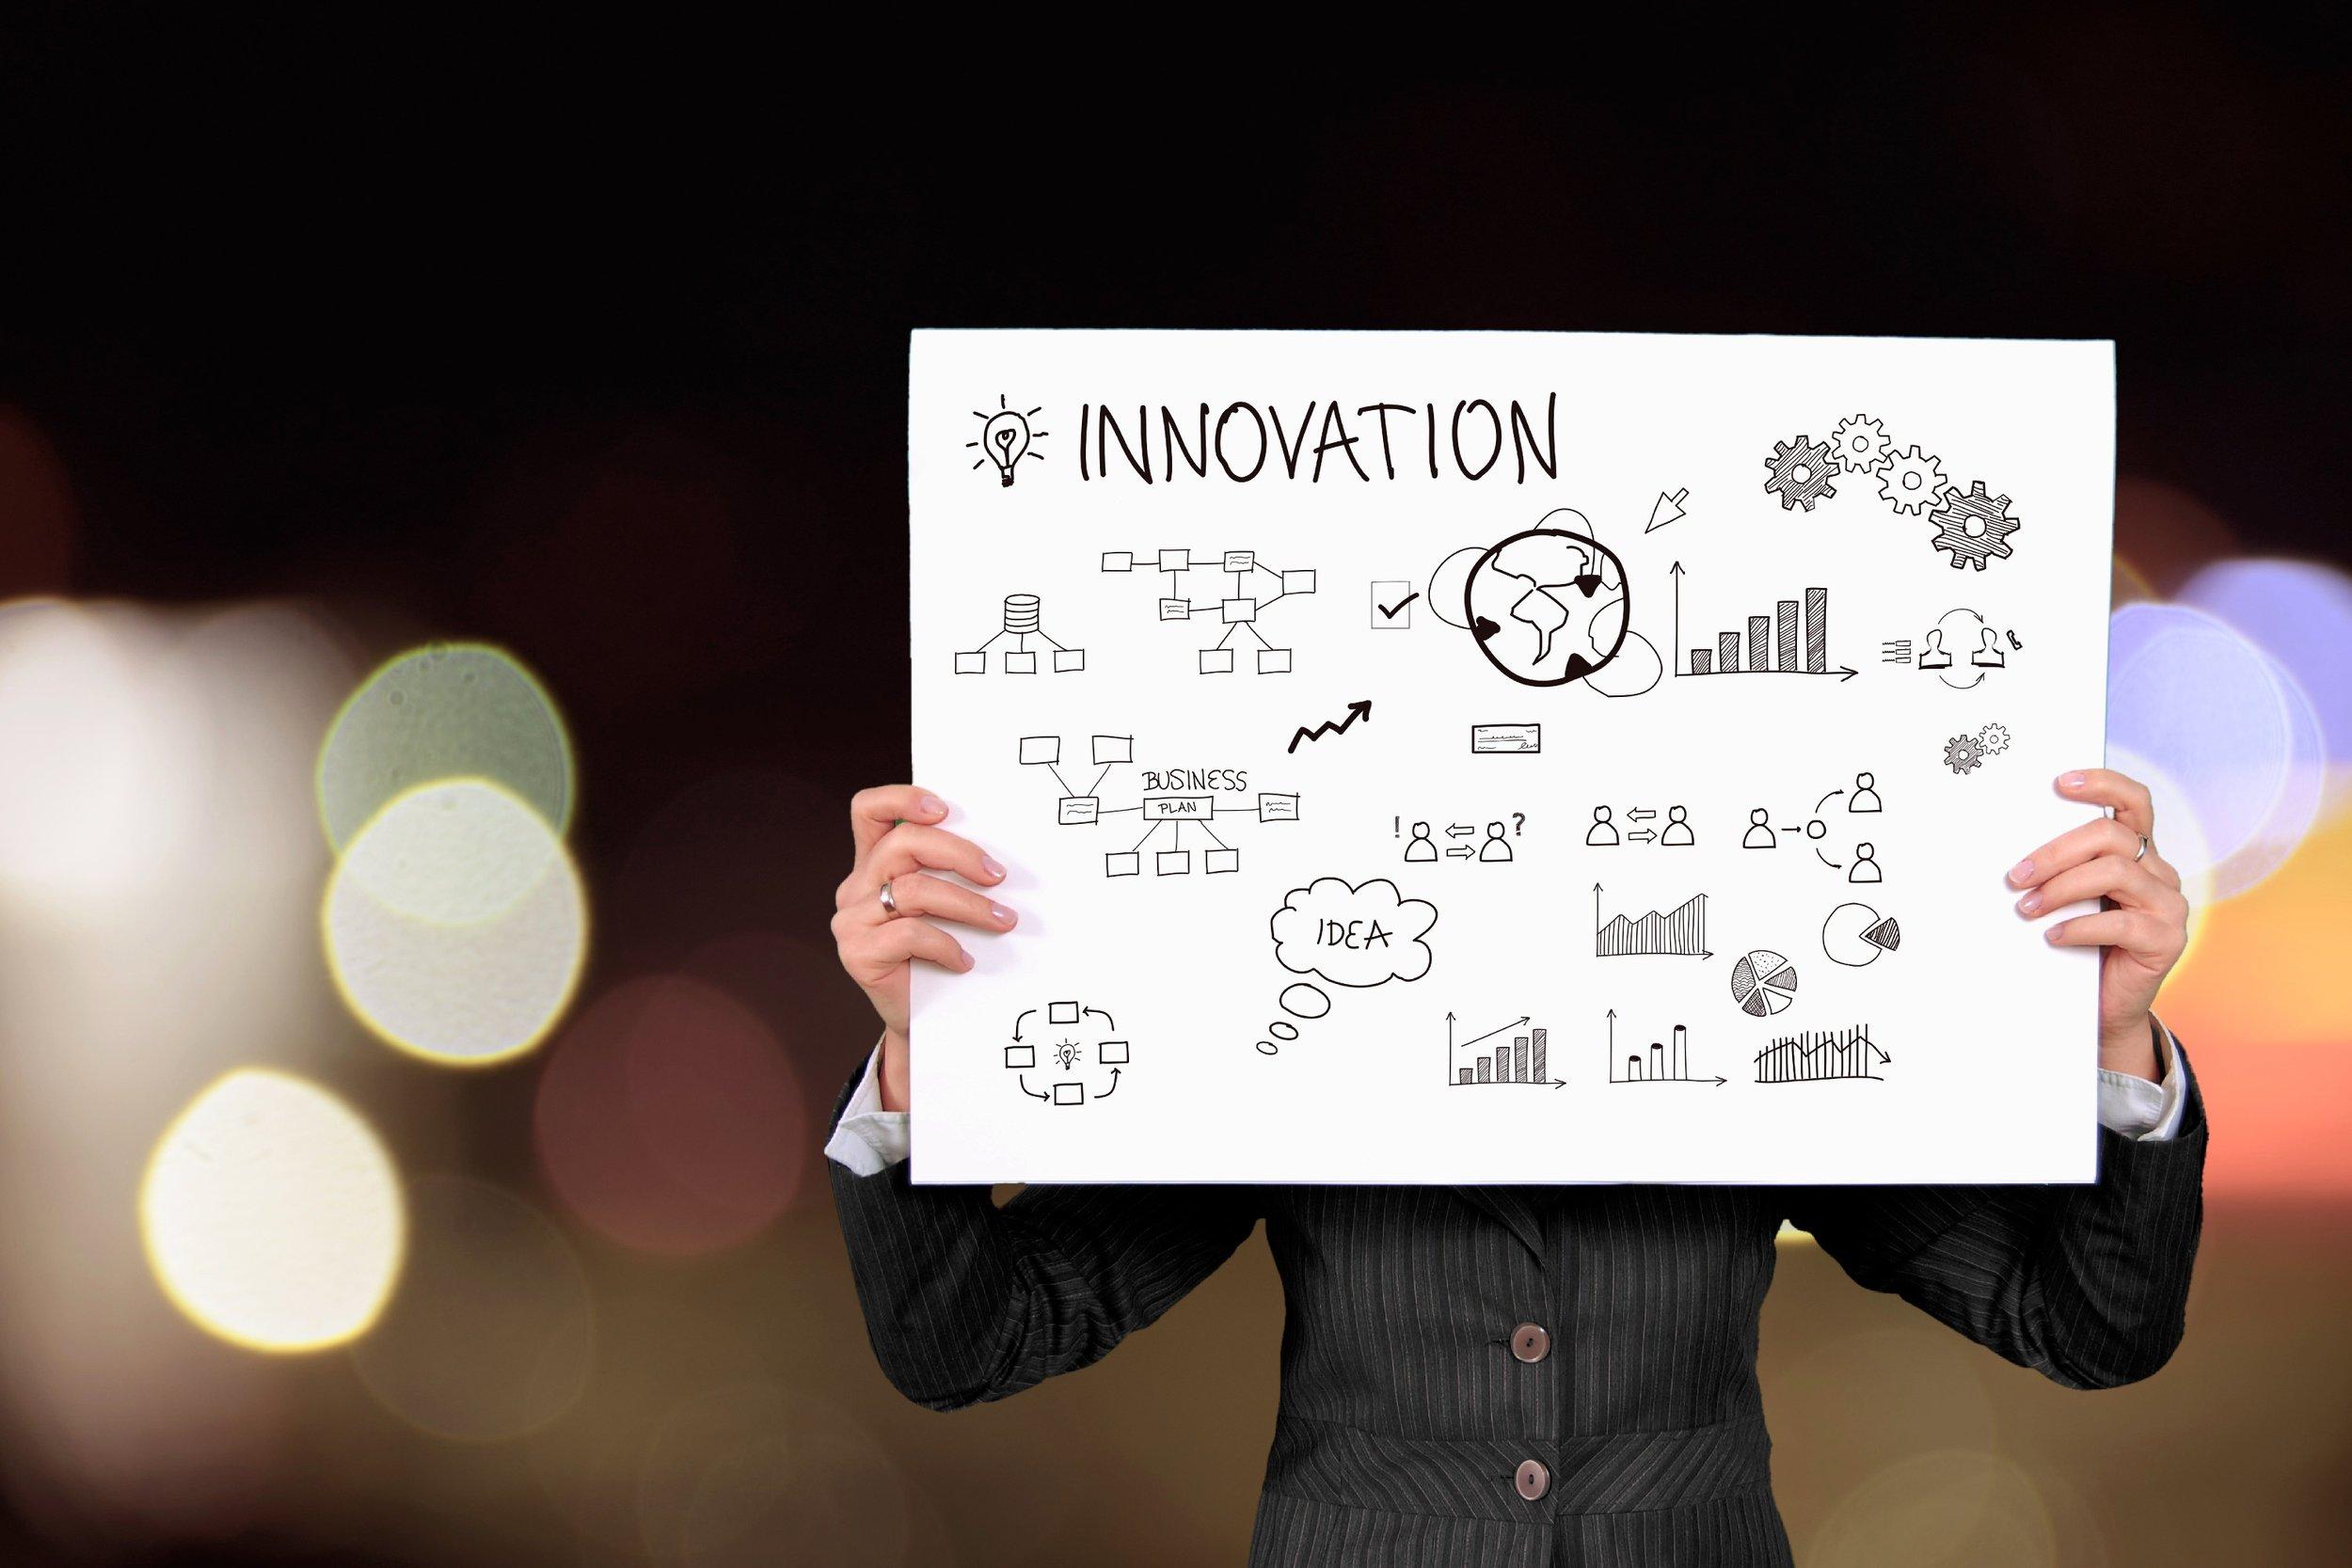 money-business-brand-graph-icon-presentation-emotion-innovation-918235.jpg